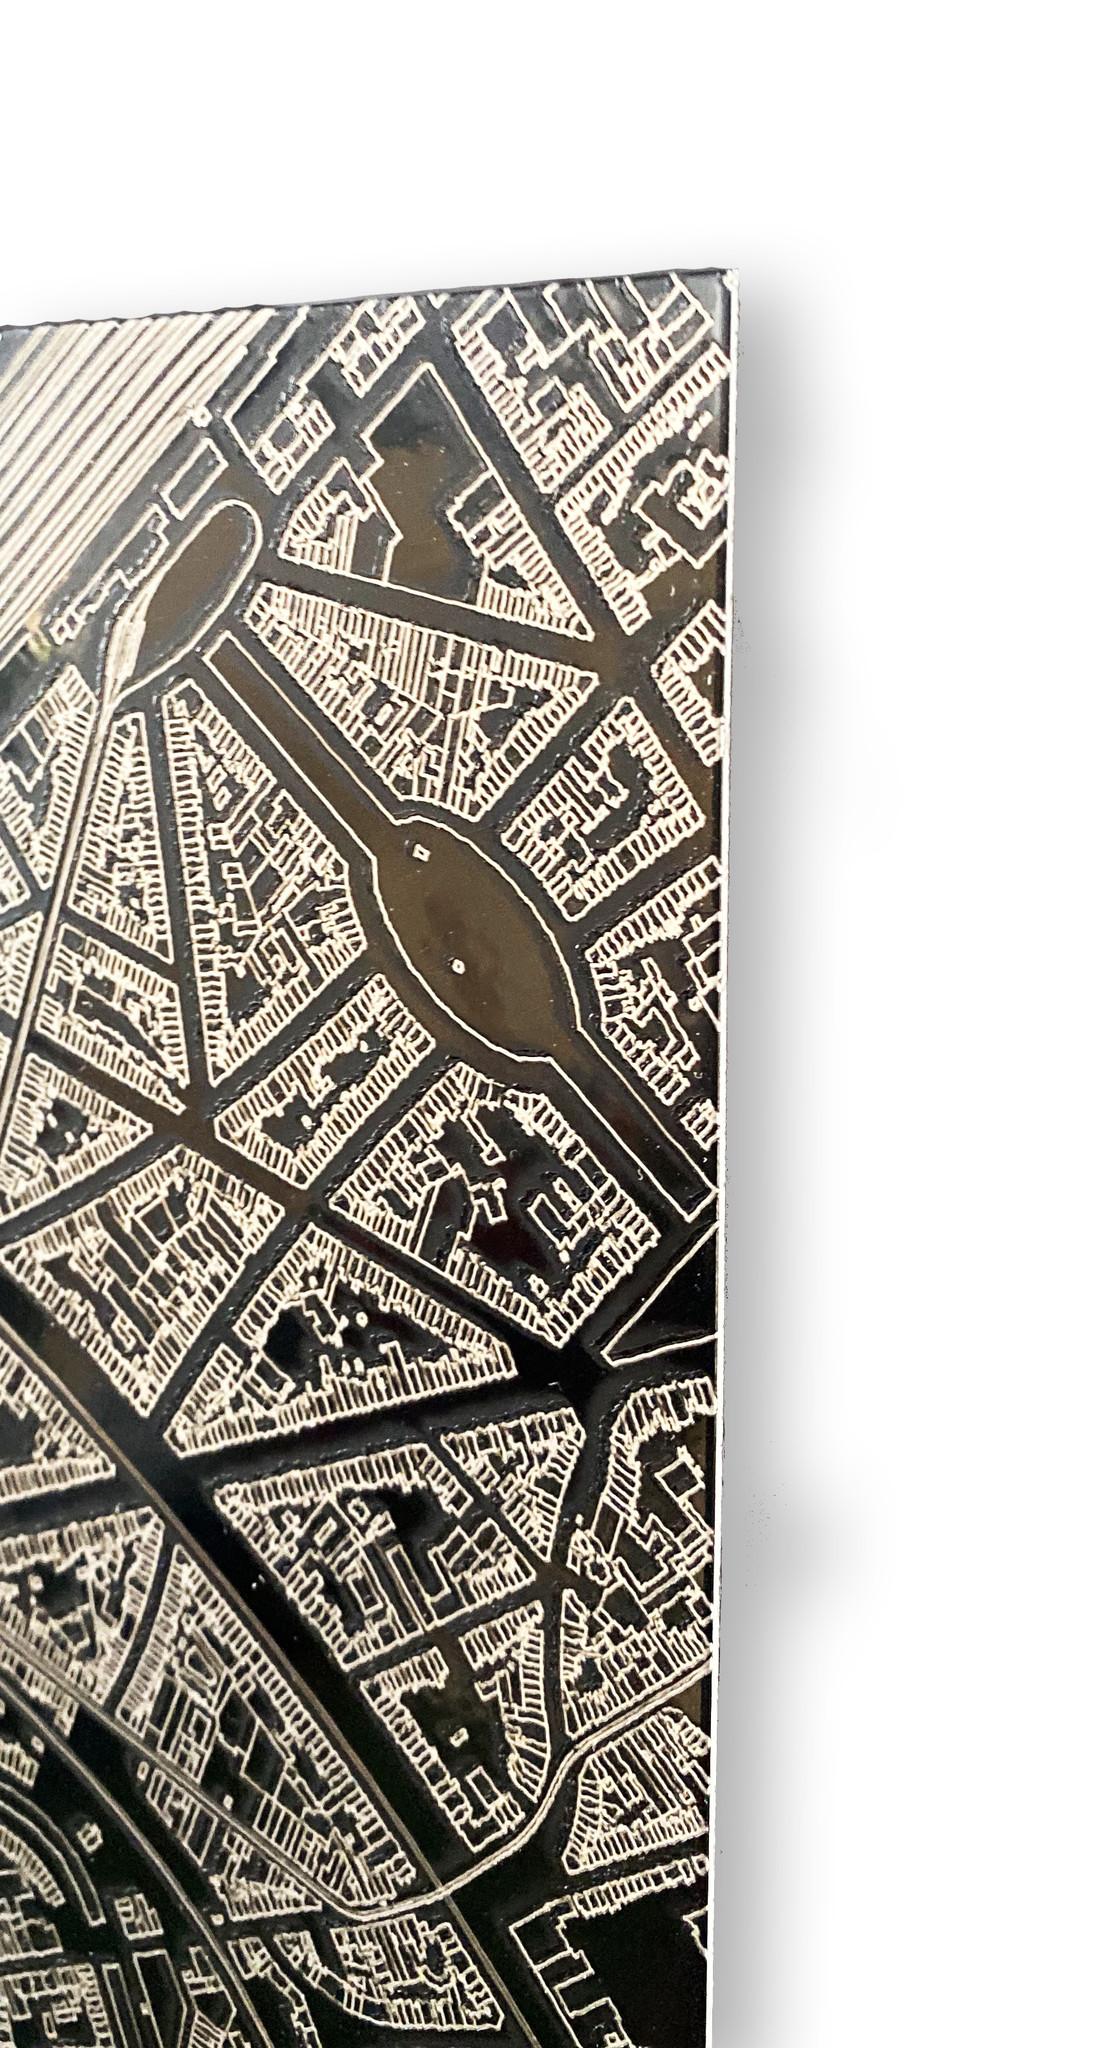 Stadtkarte Luik | Aluminium Wanddekoration-6